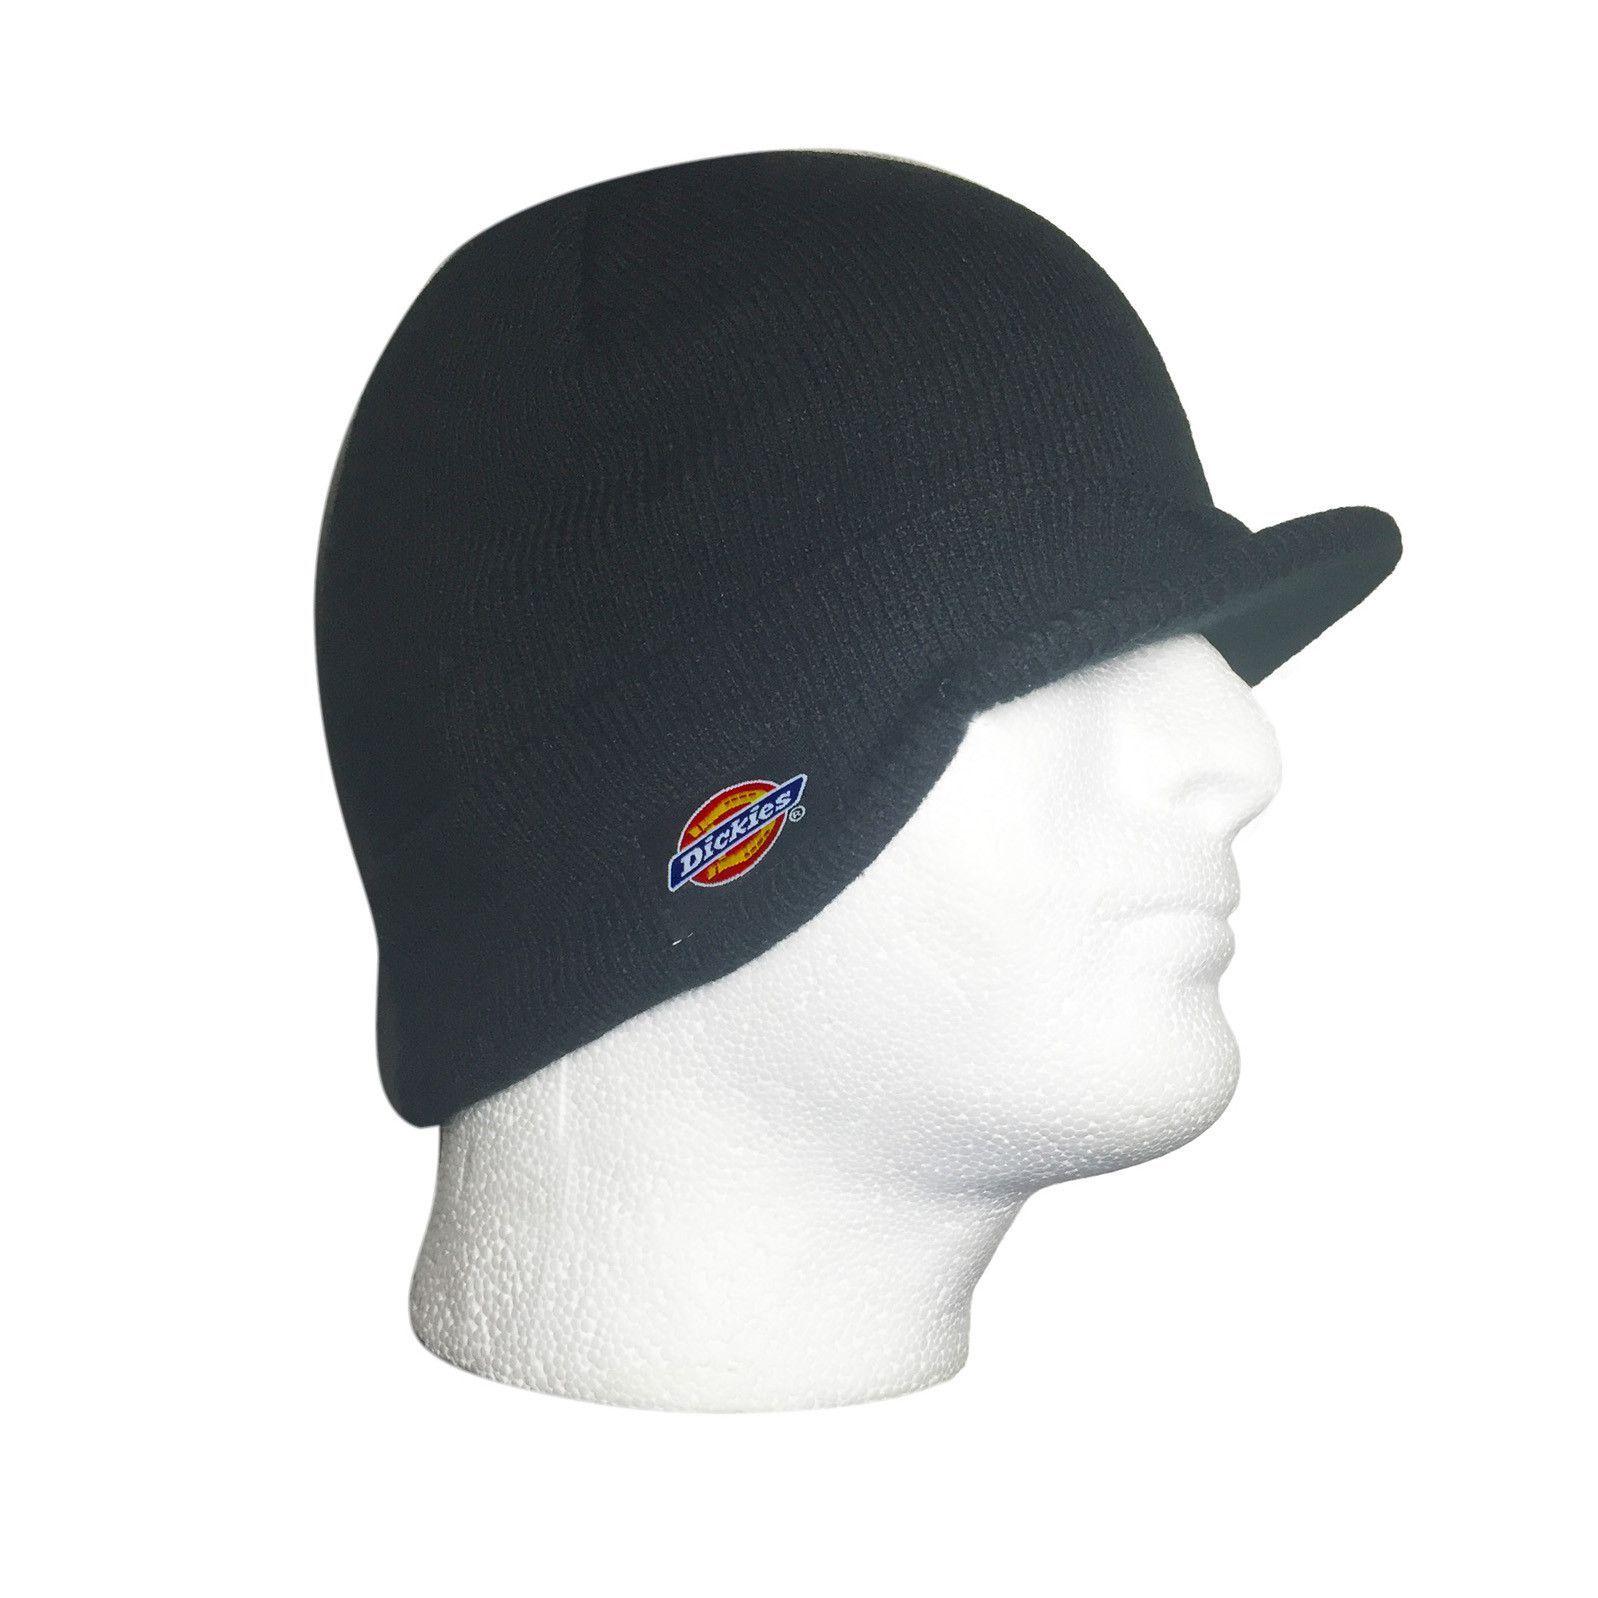 Dickies Billed Mens Double Knit Beanie Skull Cap Radar Hat Black One Size  UNISEX 456ef8d2bf2